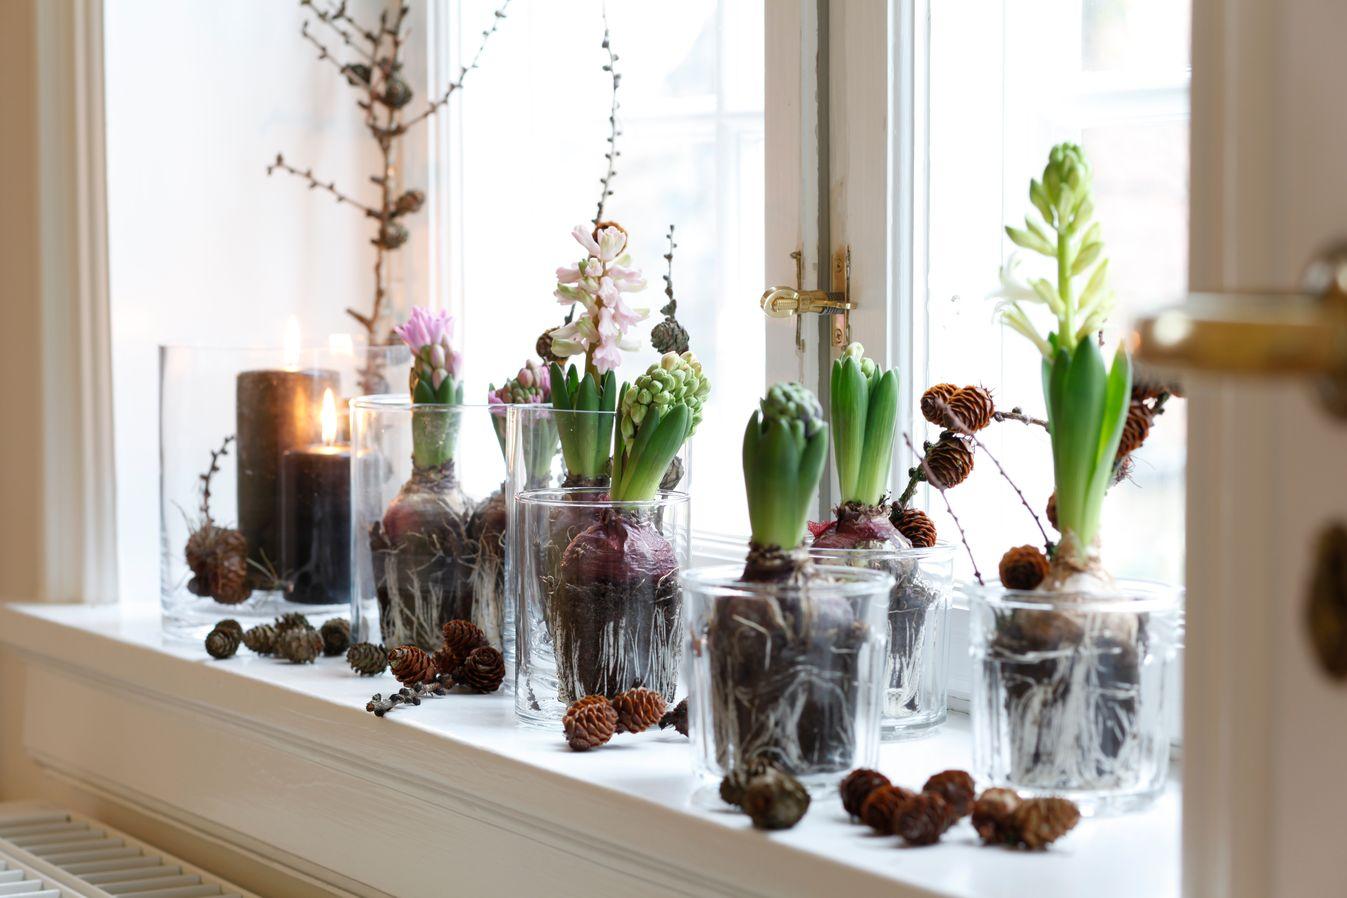 Hyacinth window